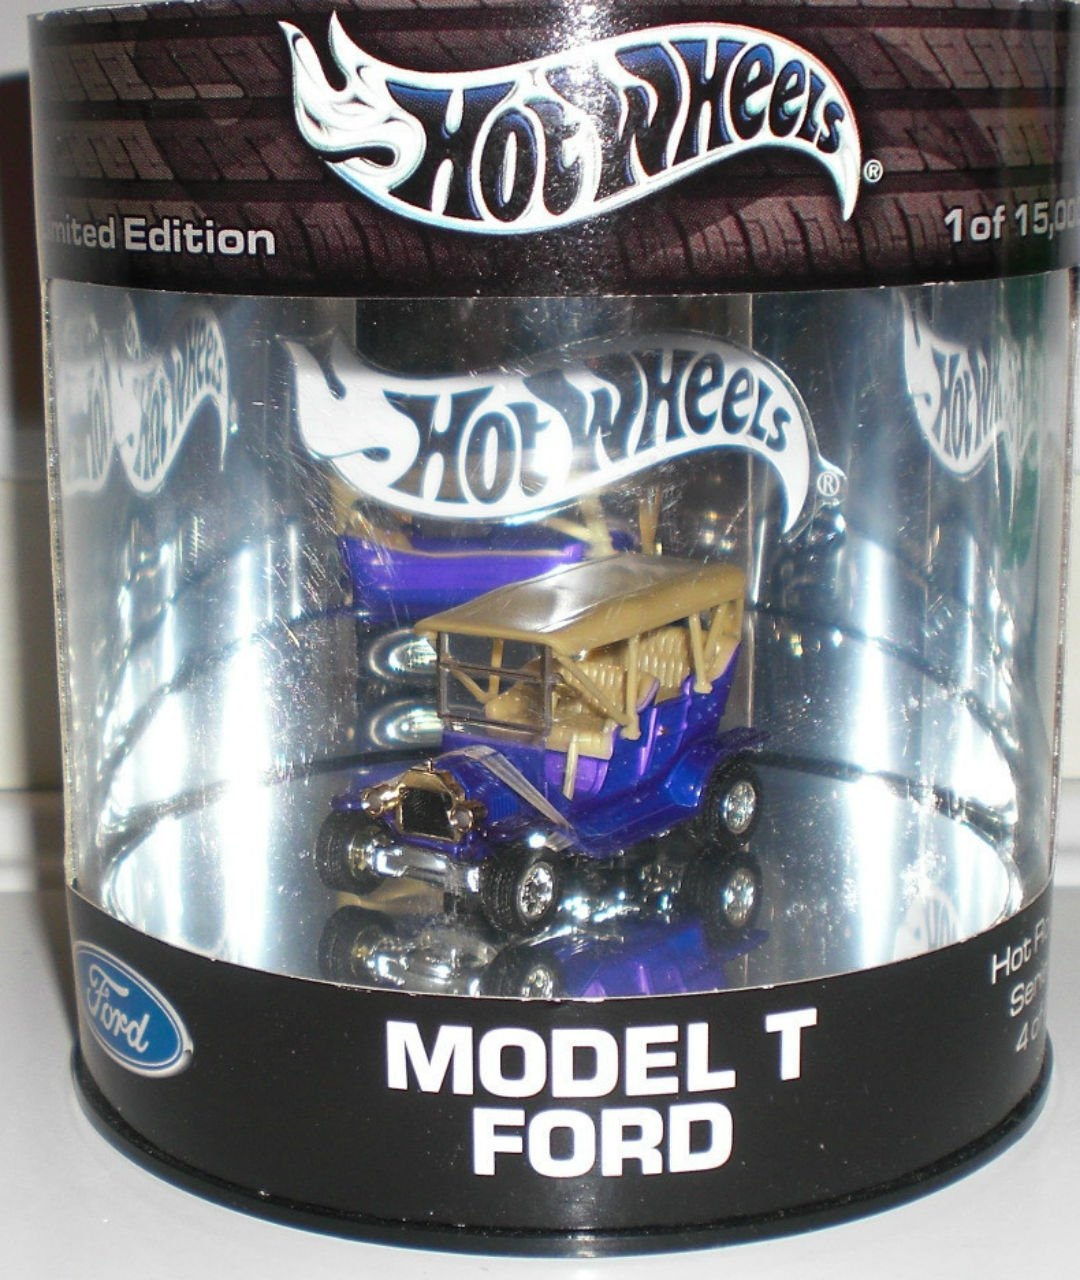 Amazon.com: Hot Wheels Hot Rod Series Model T Ford 1/15,000: Toys ...